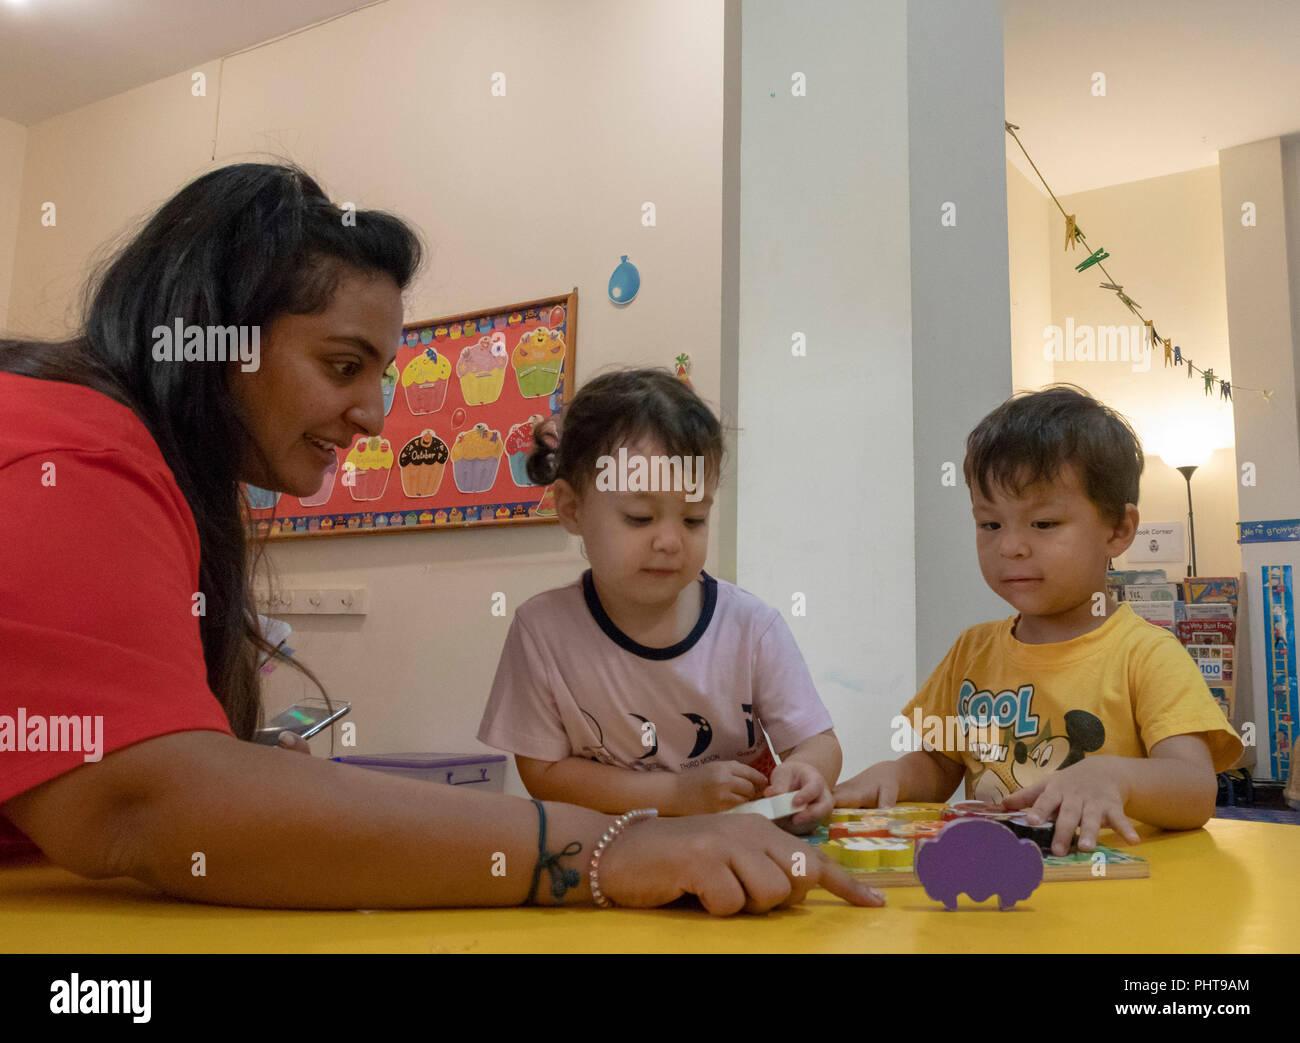 teacher with children at preschool, Cairo, Egypt - Stock Image